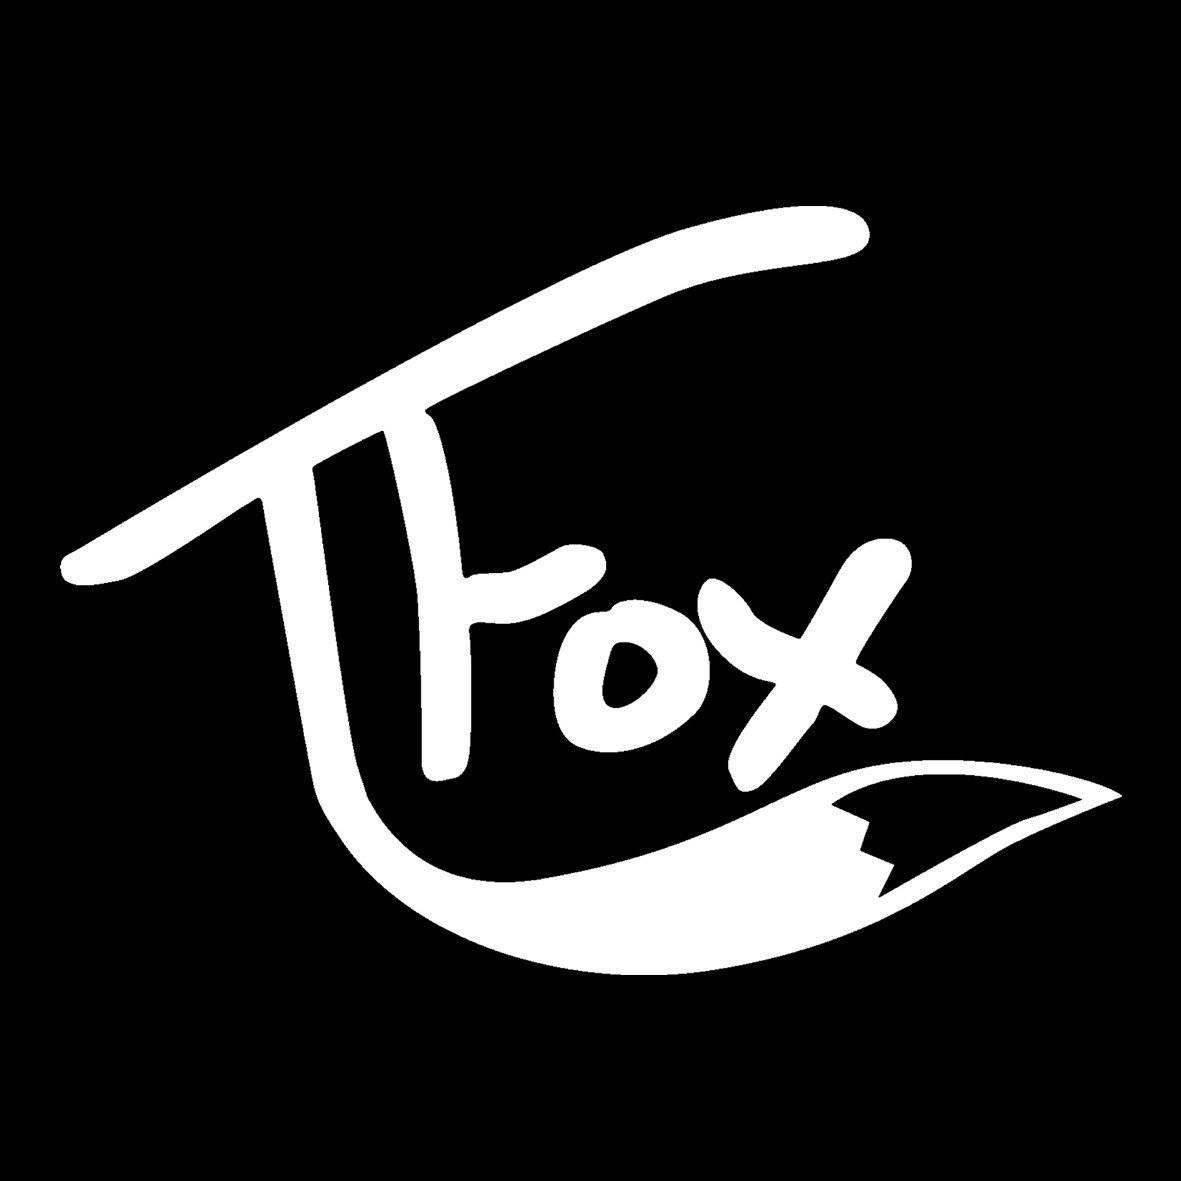 tanner fox t fox brand wheels scooters